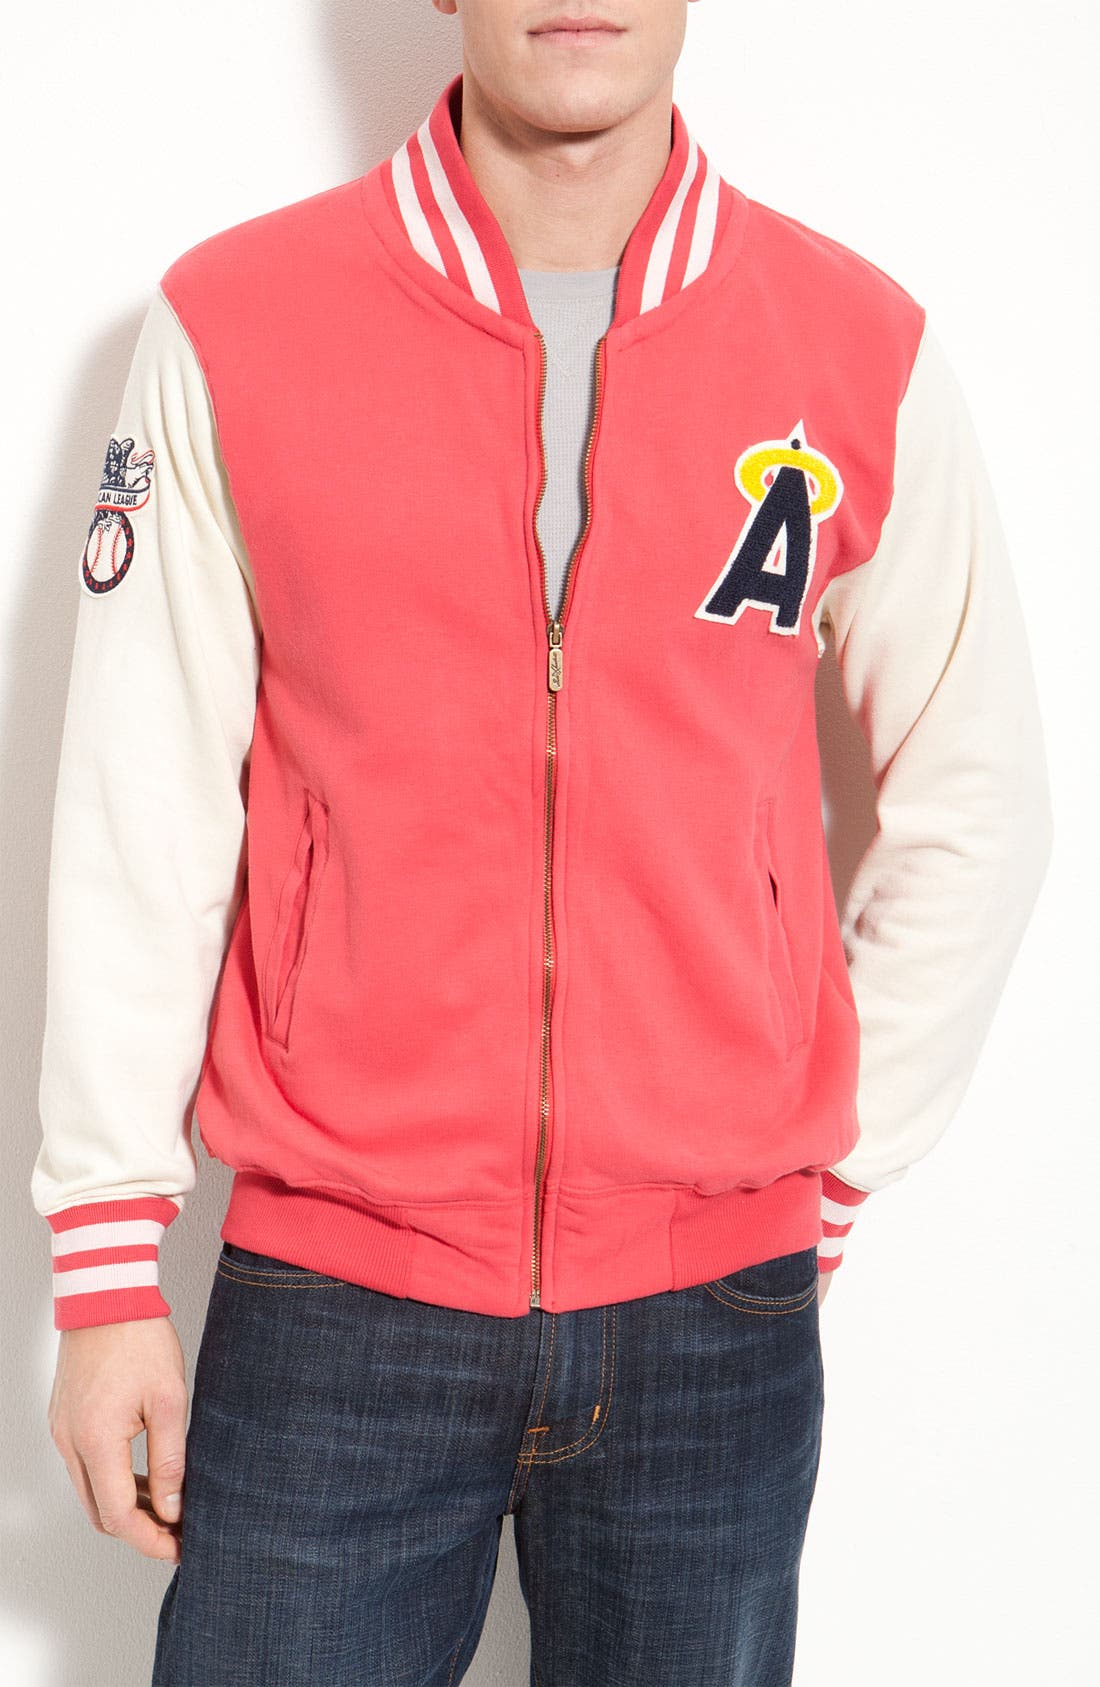 Main Image - Red Jacket 'Homeroom Angels' Jacket